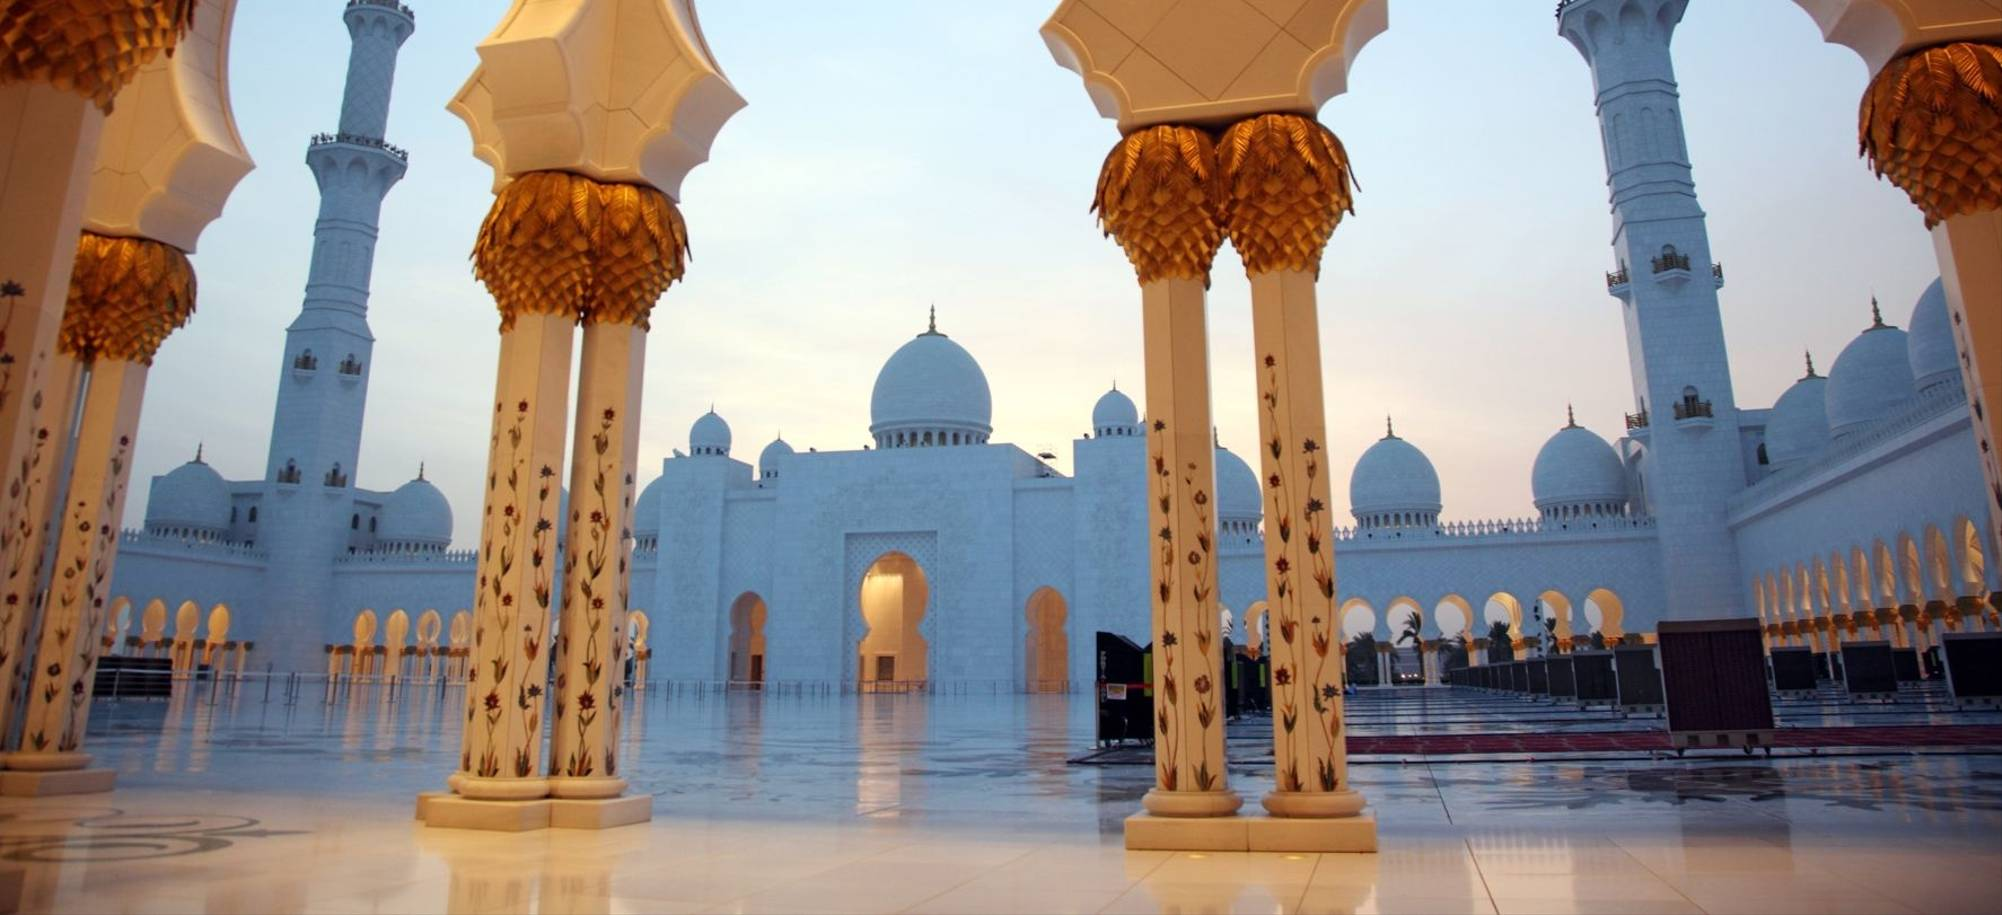 Abu Dhabi 01 -Sheikh Zayed Grand Mosque - Itinerary Desktop .jpg